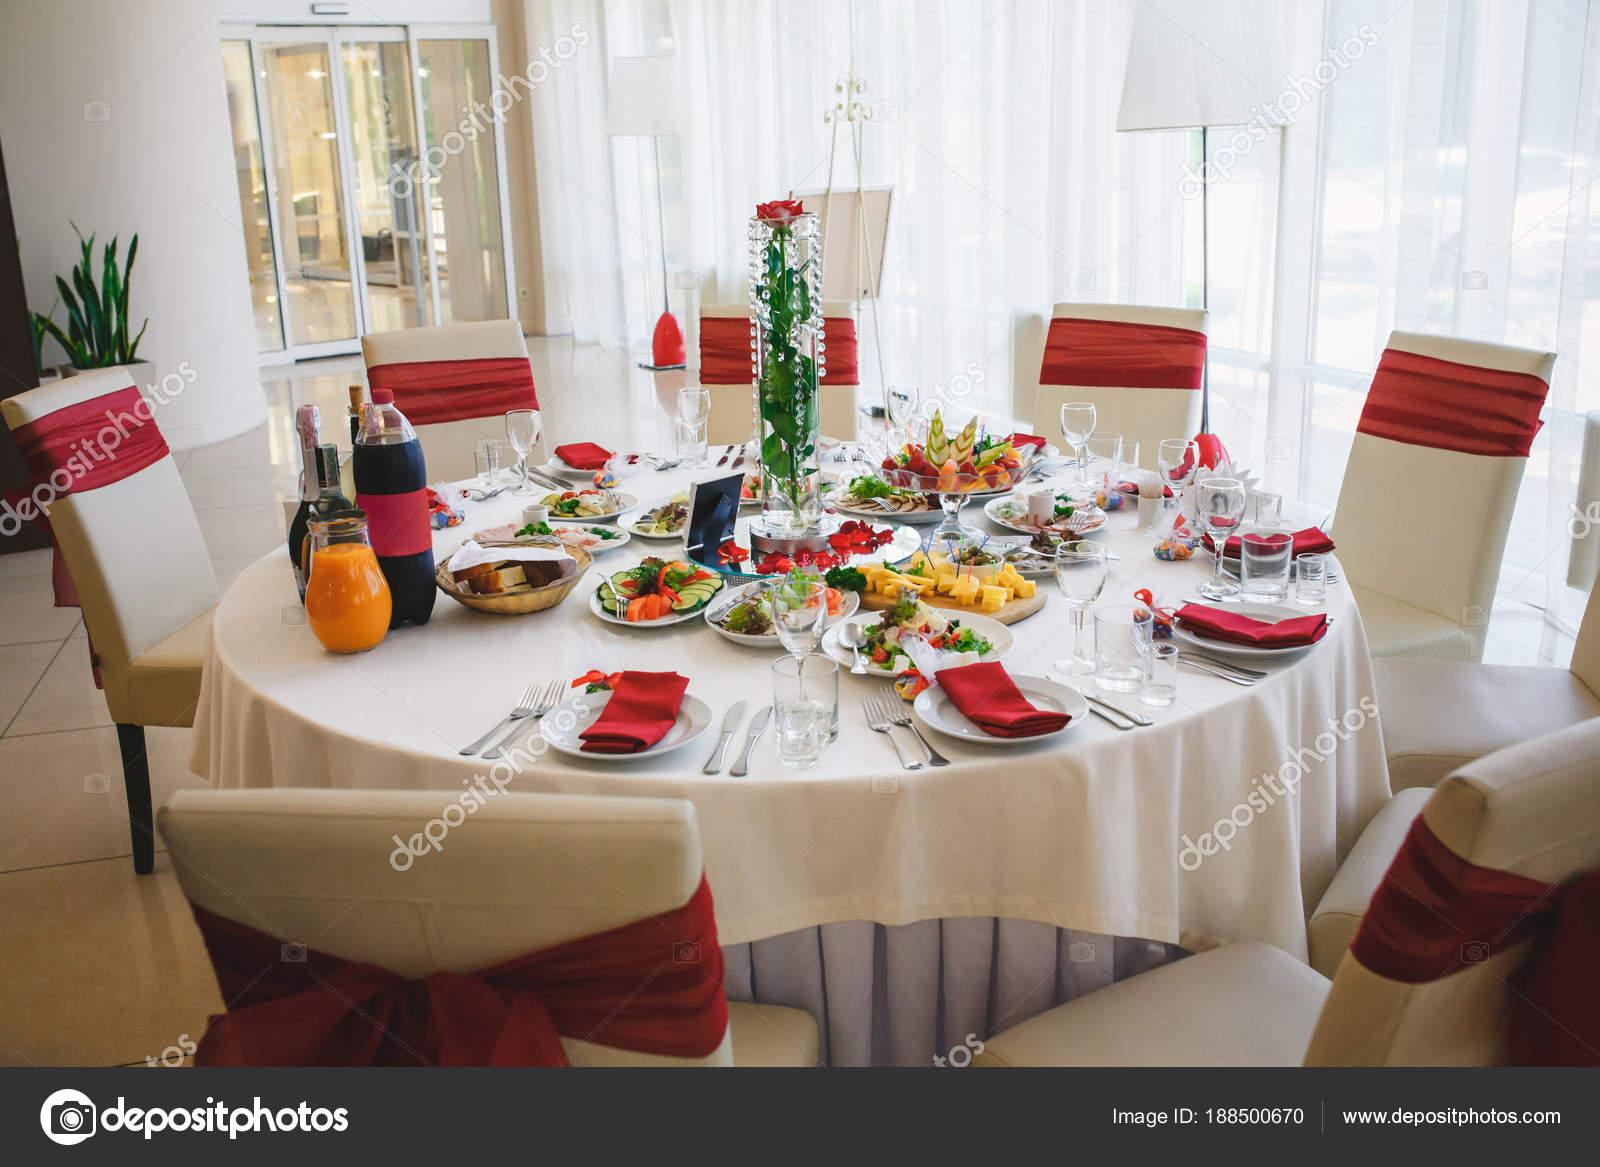 burgundy kitchen decor cabinet drawer replacement parts 婚礼桌设置在华丽的宴会厅与勃艮第 图库照片 c vladimirstarkov 188500670 婚礼桌设置在华丽的宴会厅与勃艮第色彩装饰 照片作者vladimirstarkov